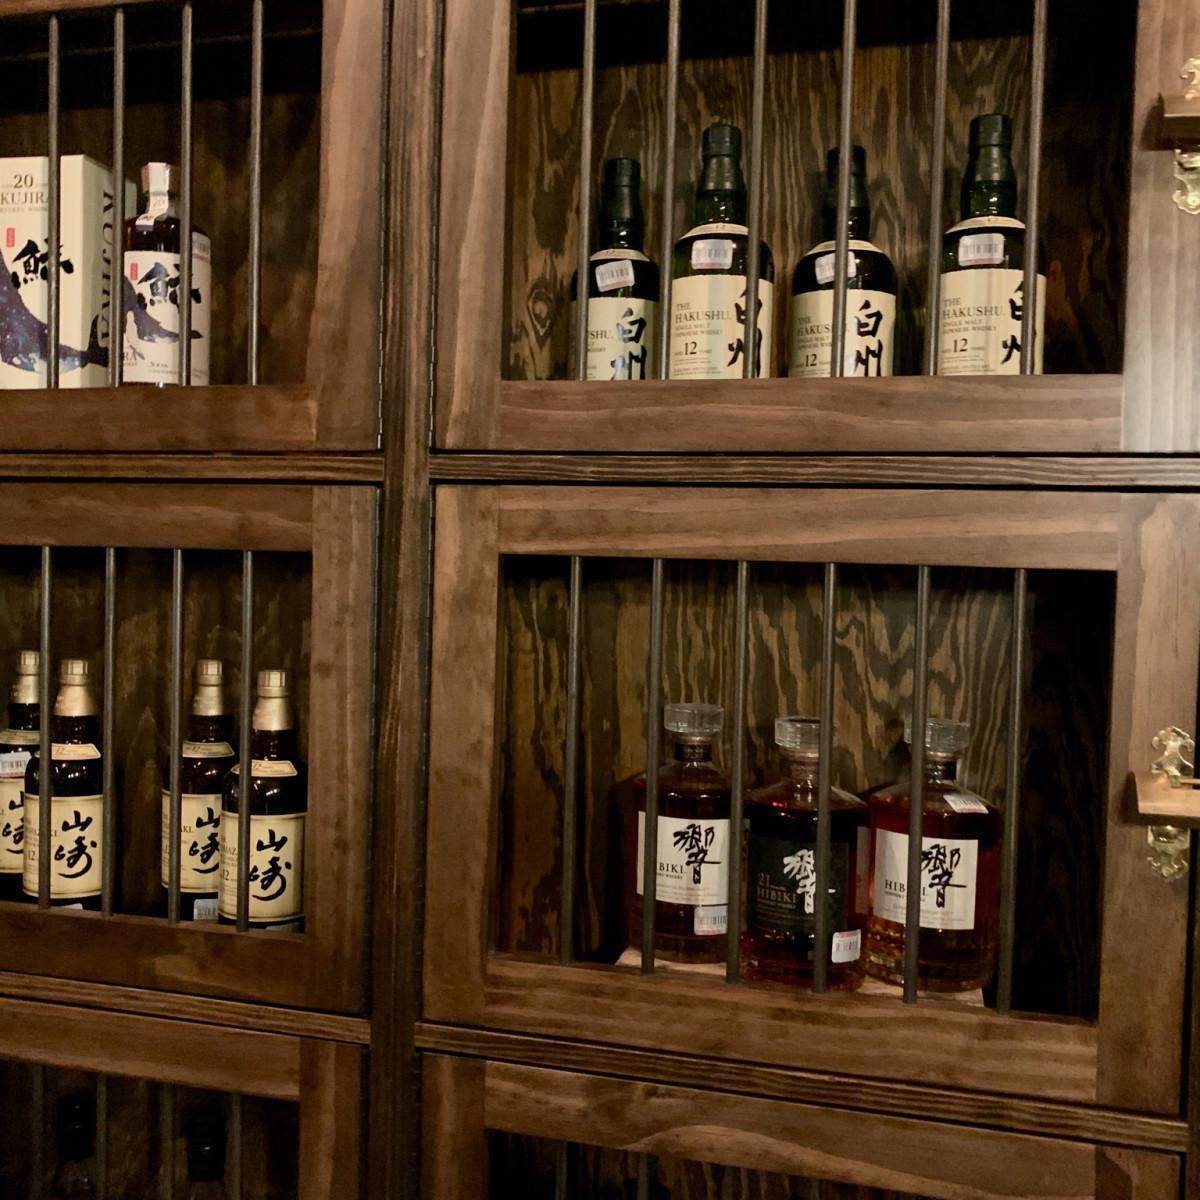 Toukei Izakaya whisky whiskey storage